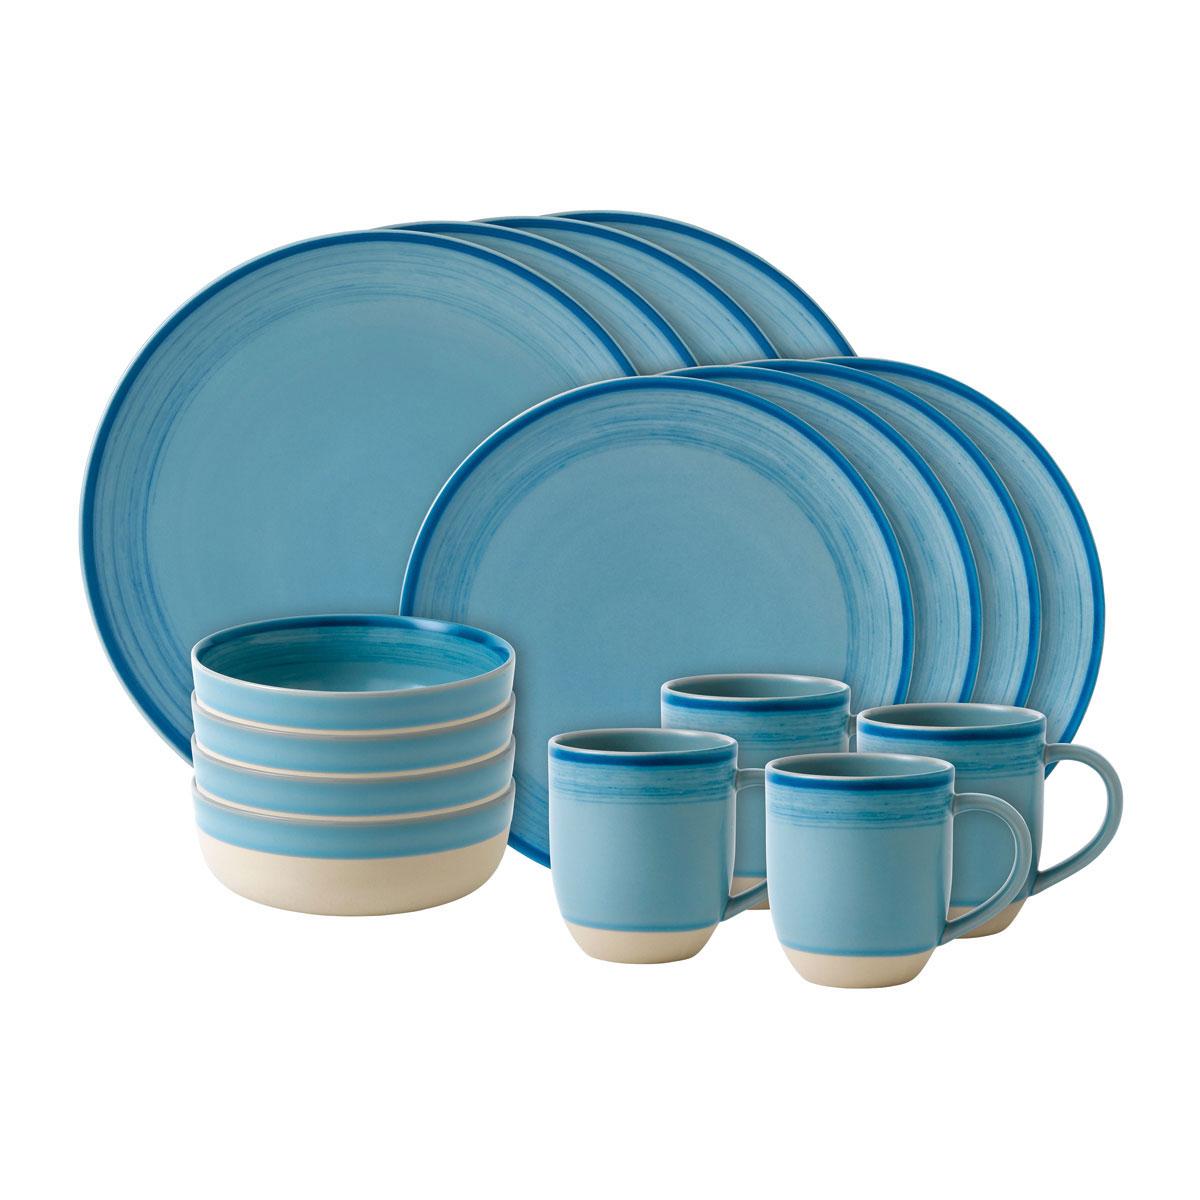 ED Ellen DeGeneres by Royal Doulton Polar Blue Brushed Glaze 16 Piece Set